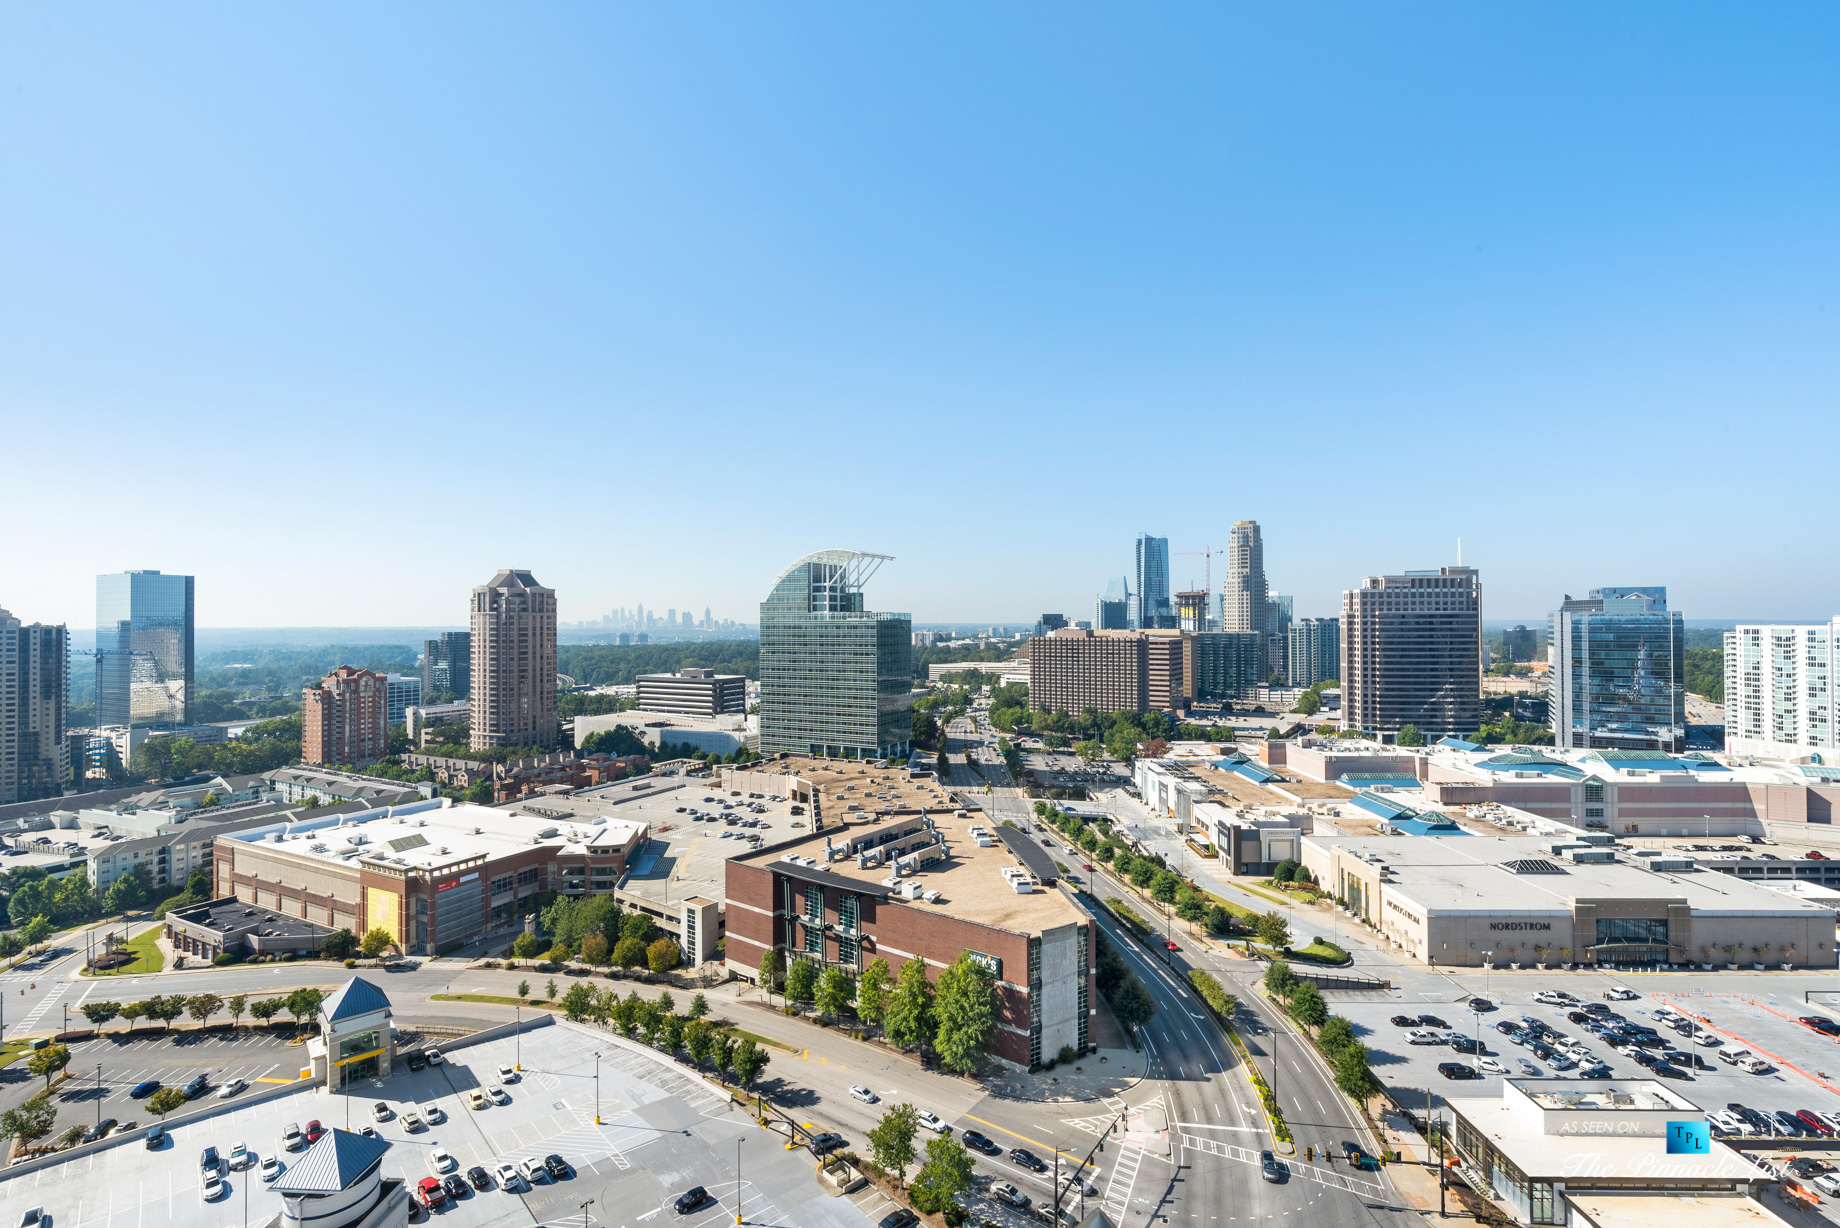 3630 Peachtree Rd NE, Unit 2808, Atlanta, GA, USA - Condo Exterior Pool Deck View - Luxury Real Estate - The Ritz-Carlton Residences Buckhead